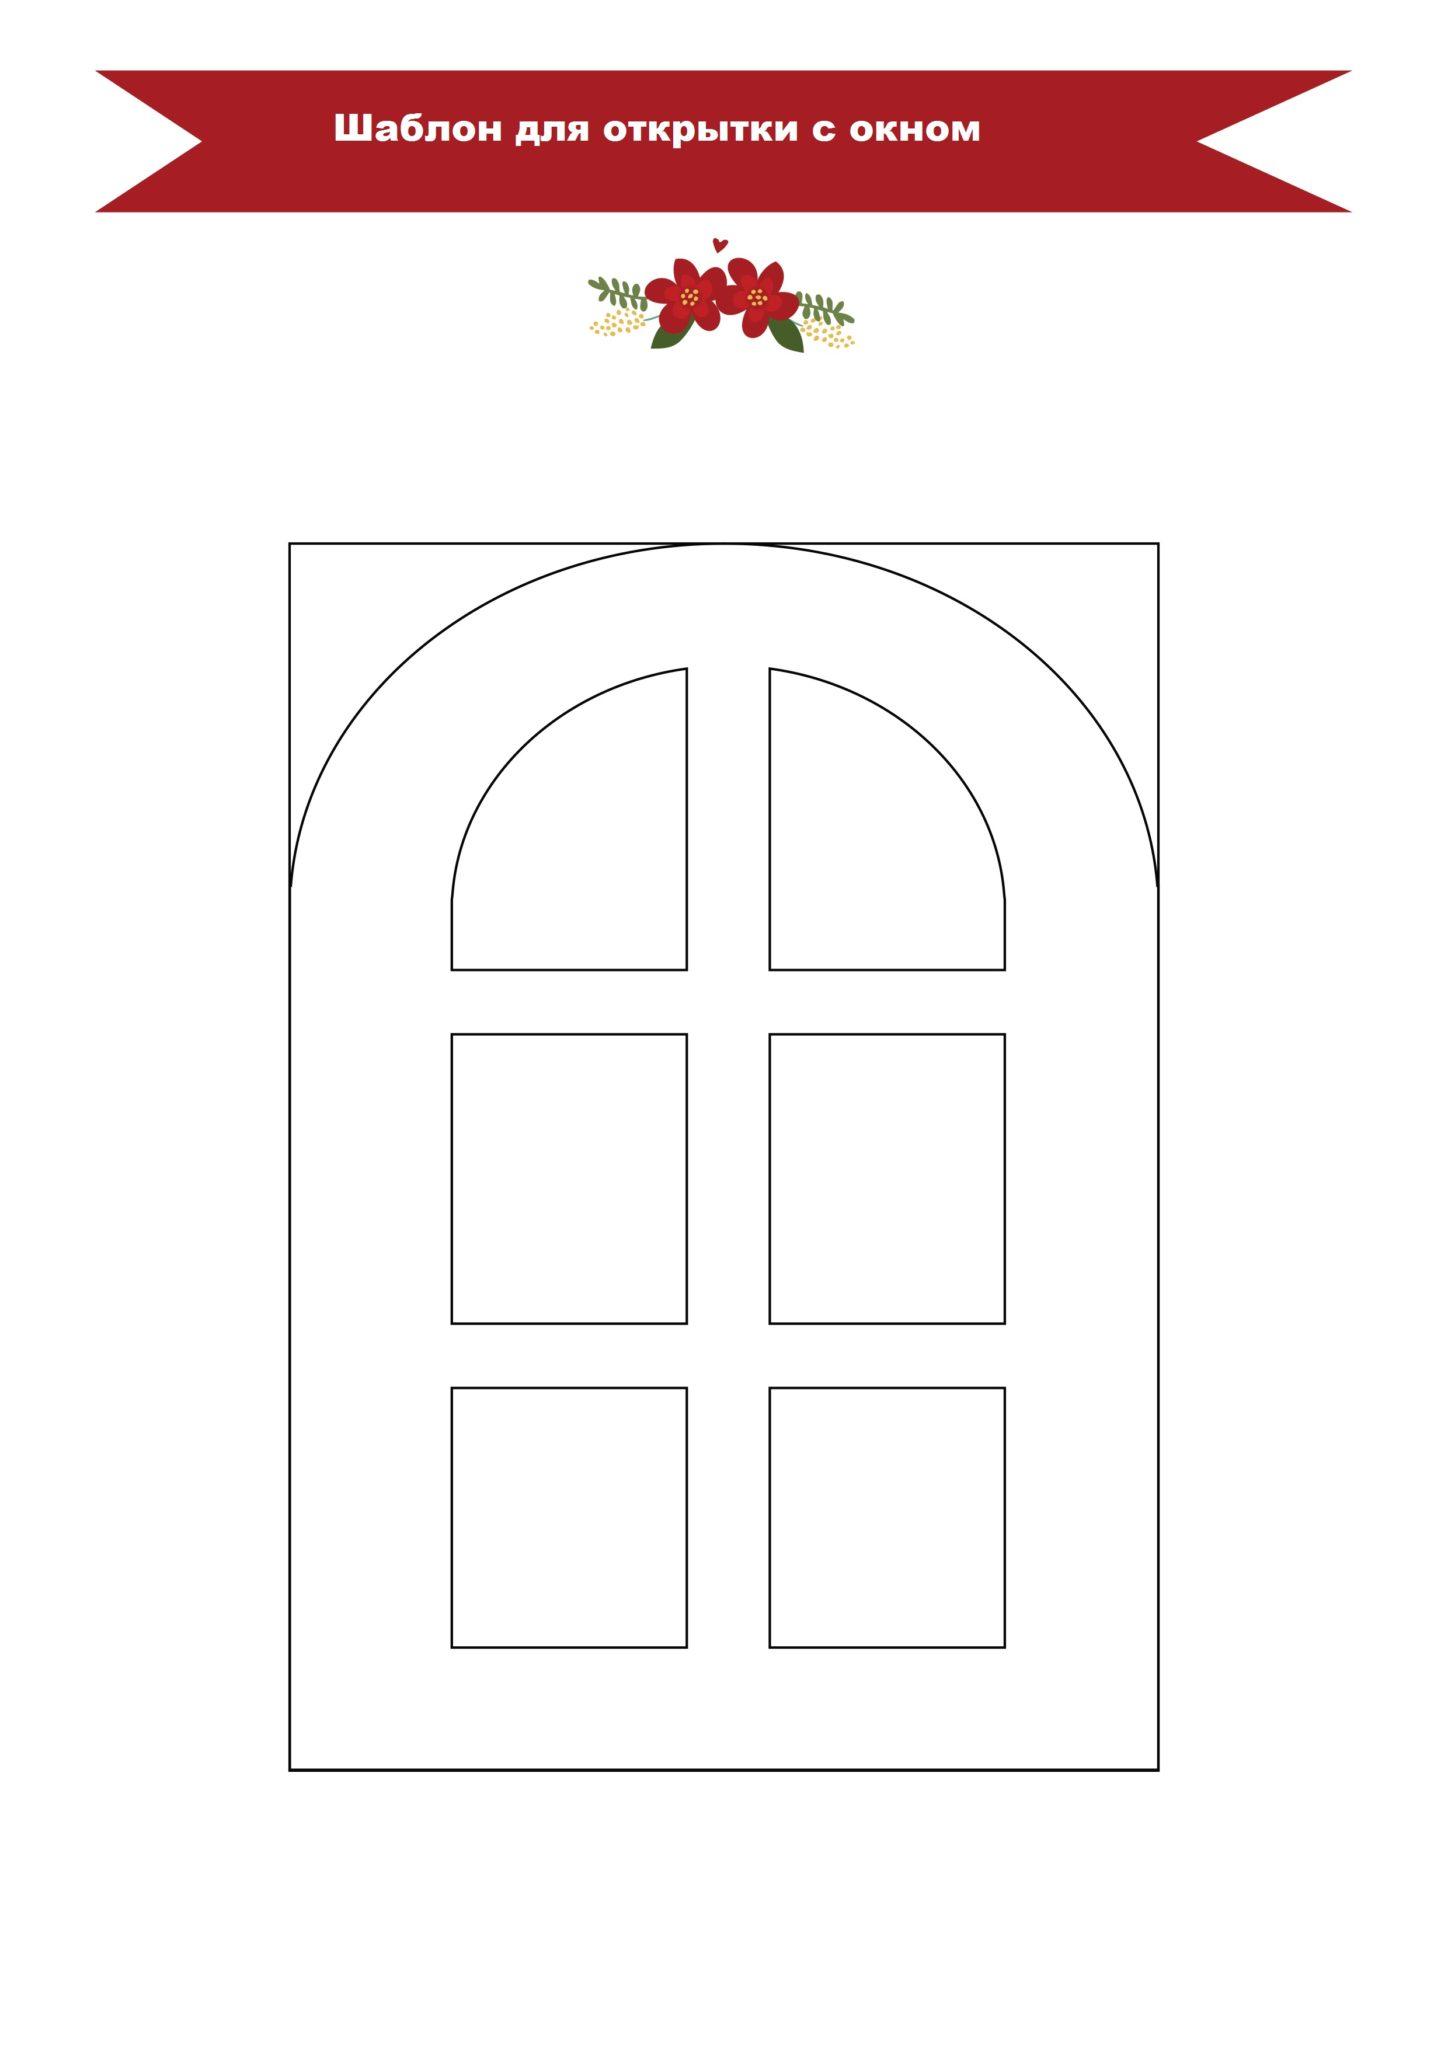 Новогодняя открытка-шаблон